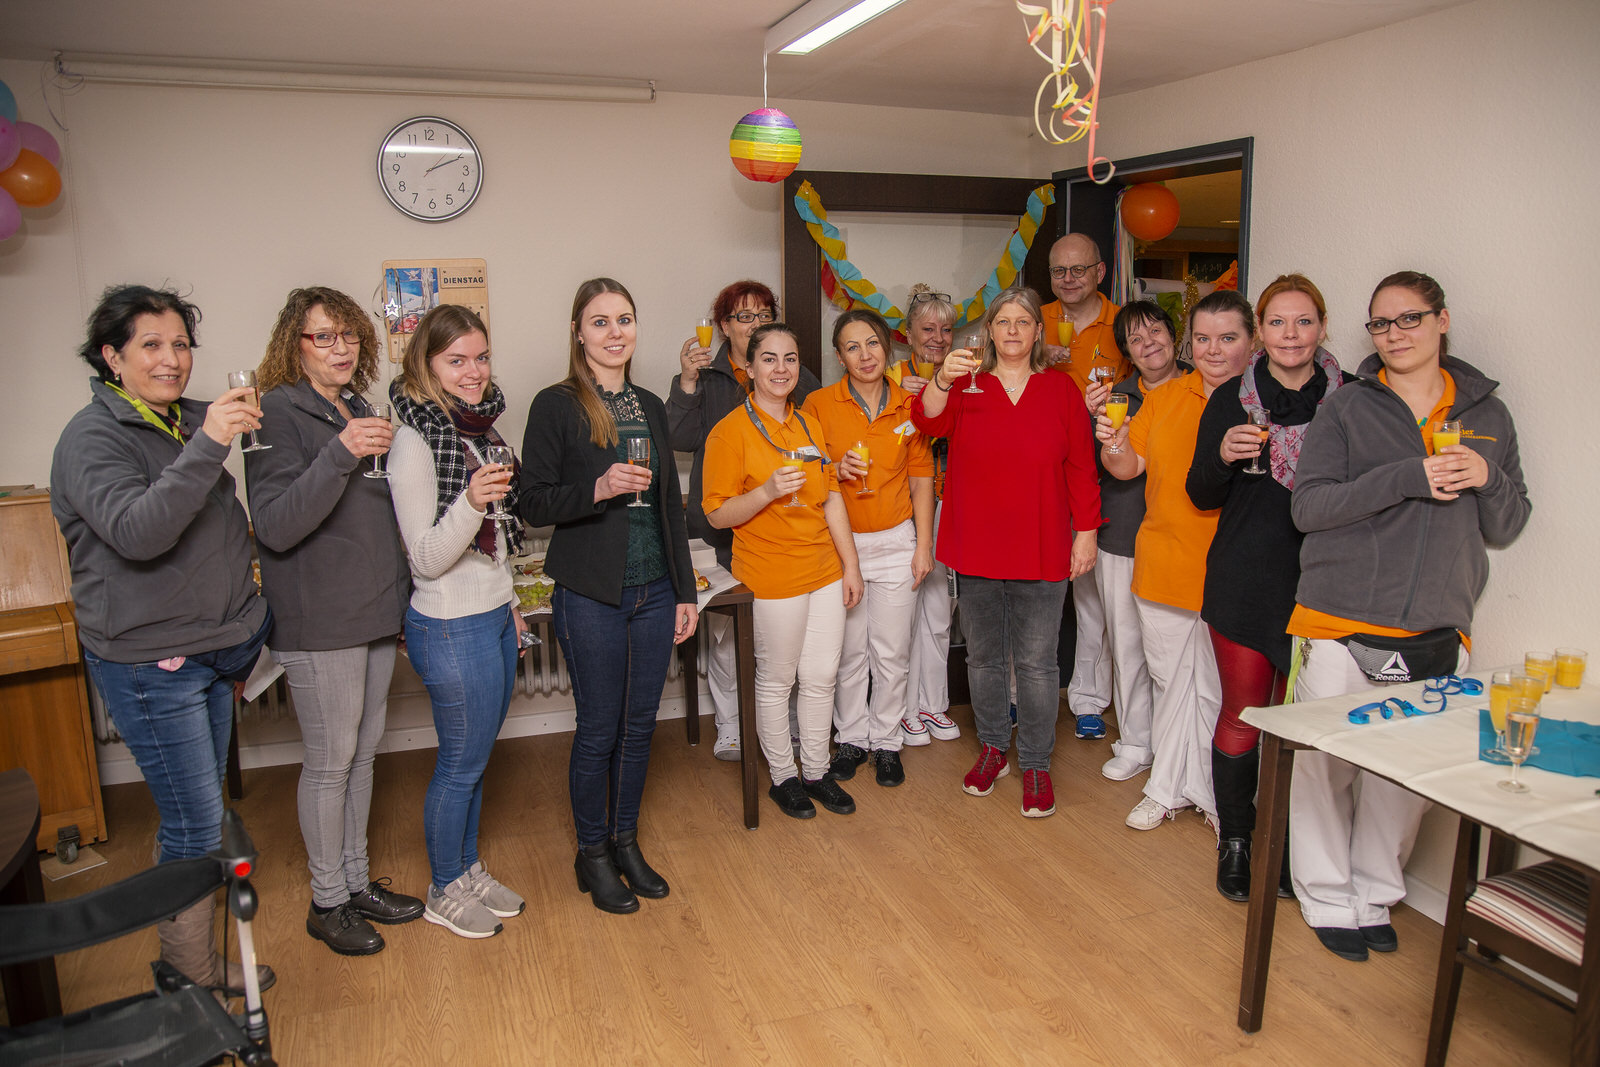 Erlenhof, tegeler Pflege & Gesundheit